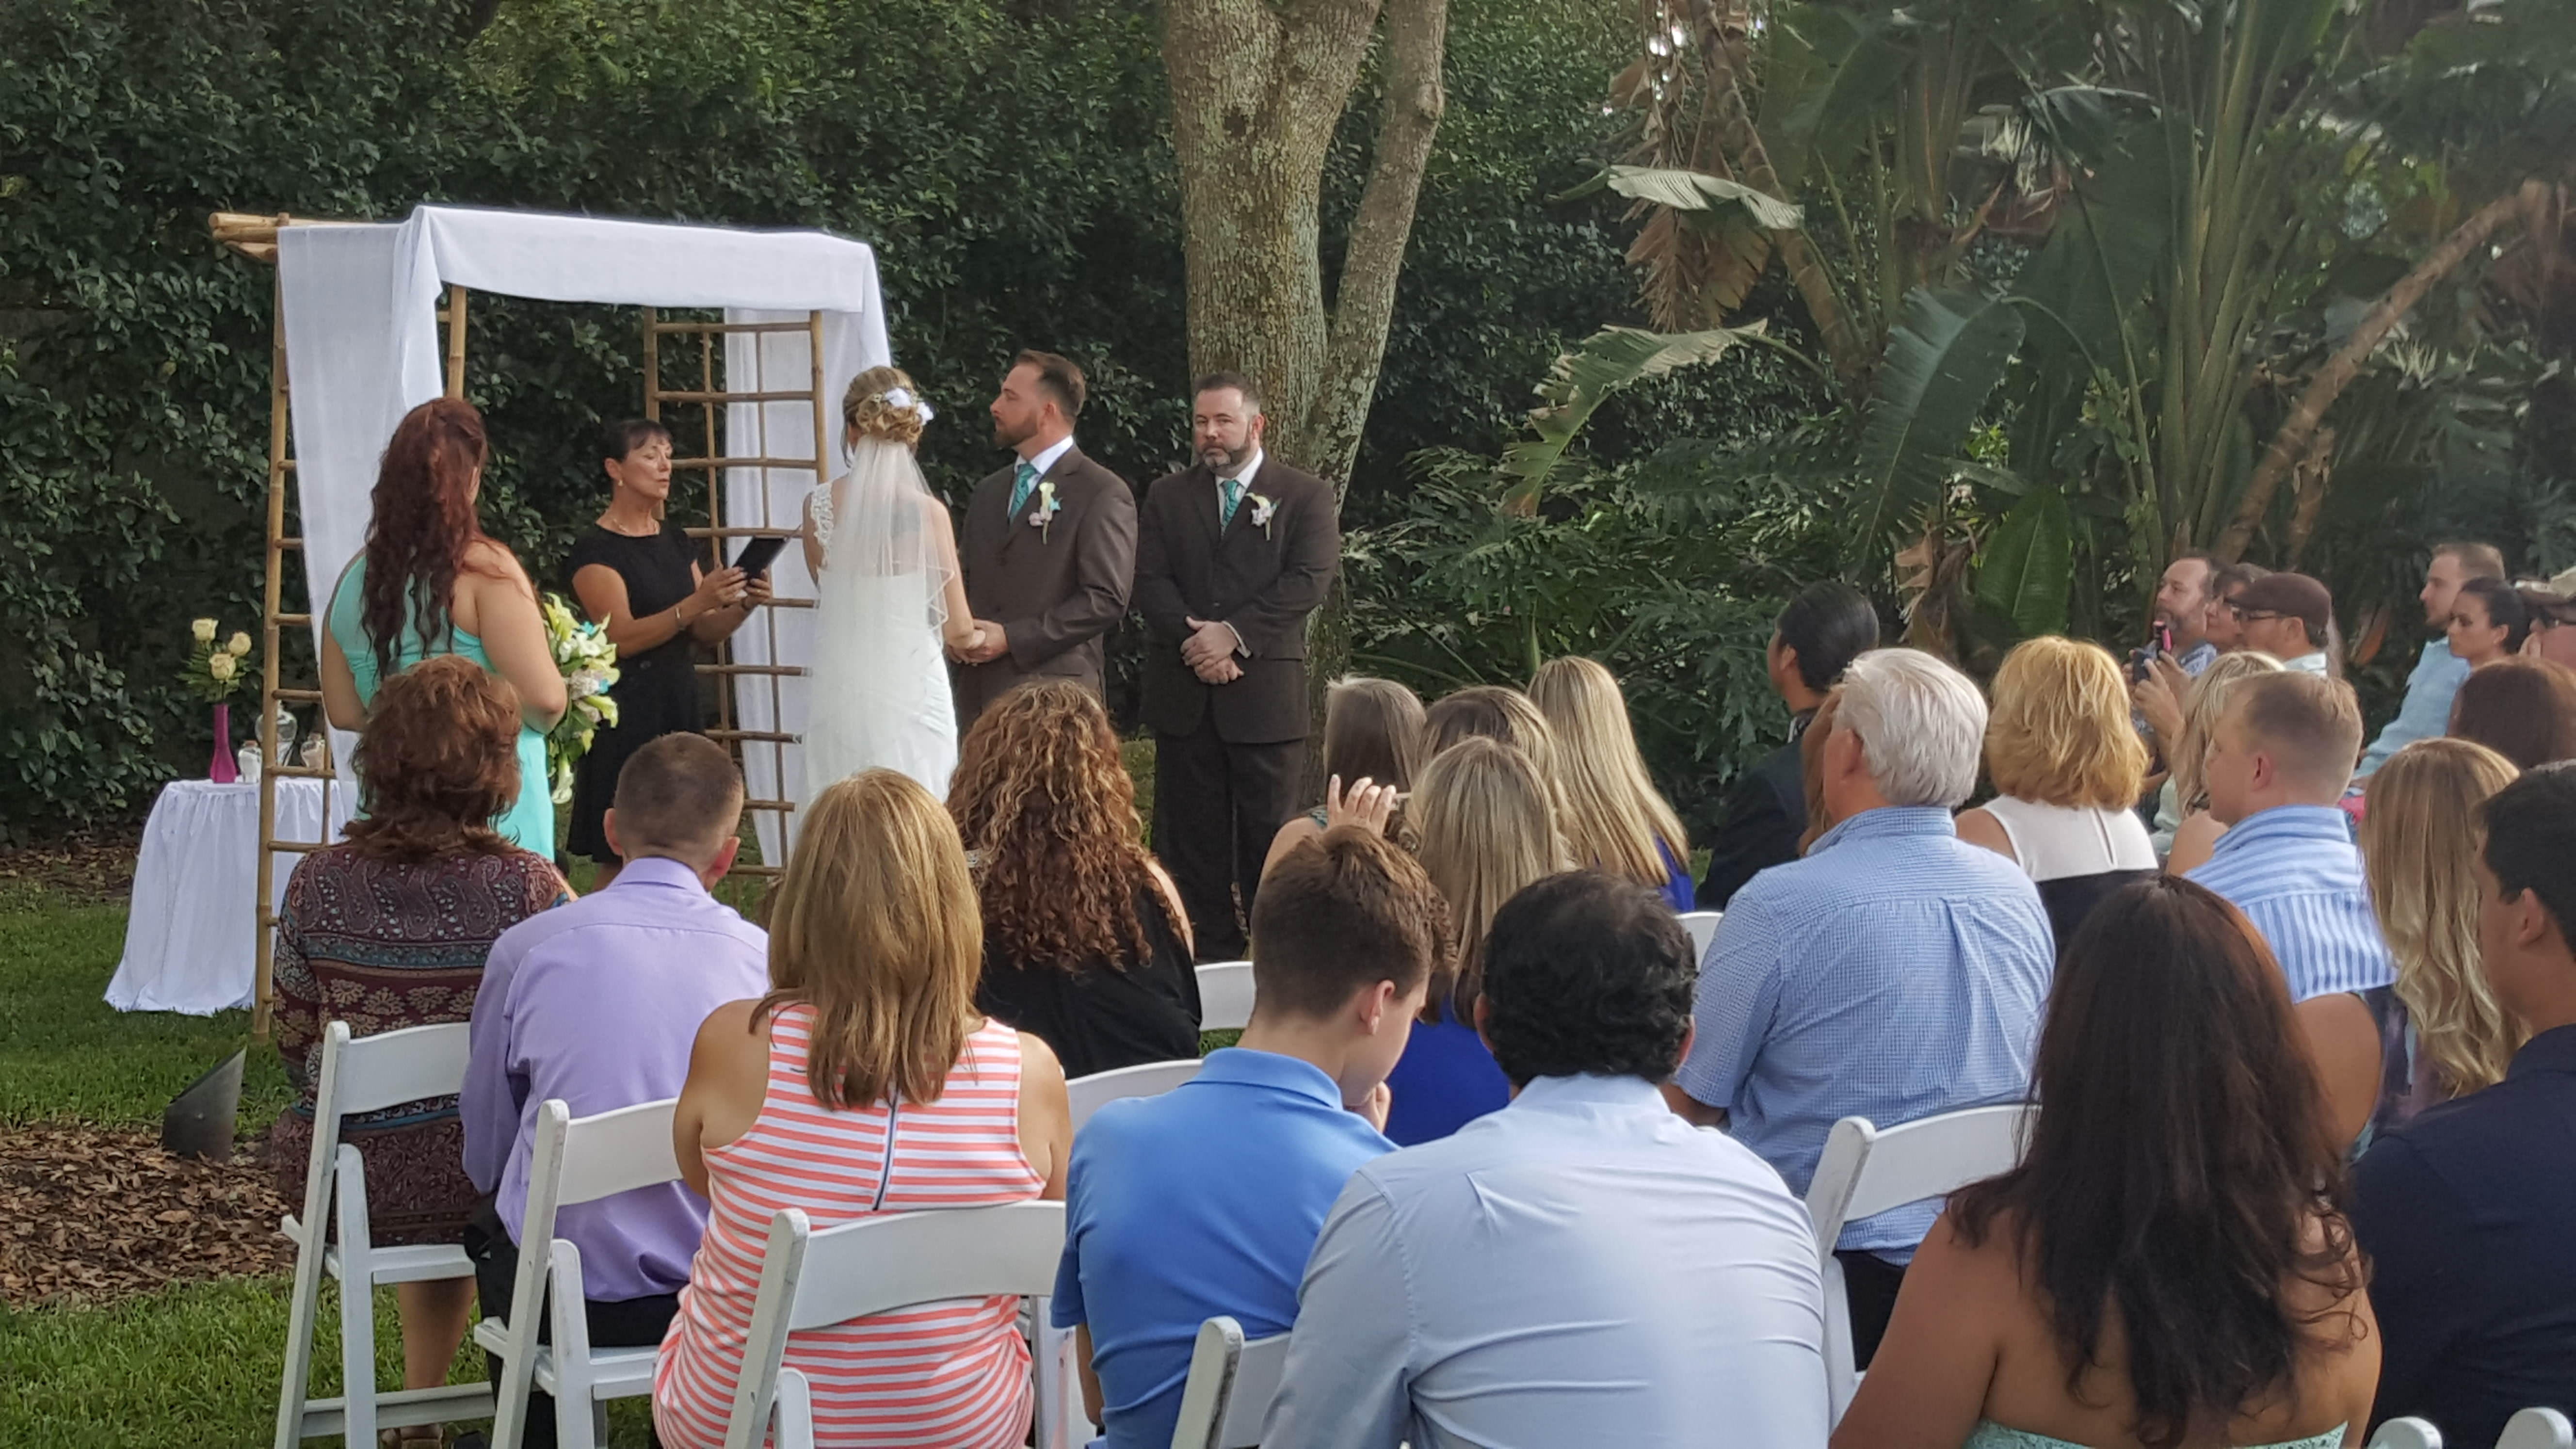 Cherished Ceremonies Weddings Tampa Wedding: Backyard Wedding Ceremony Tampa